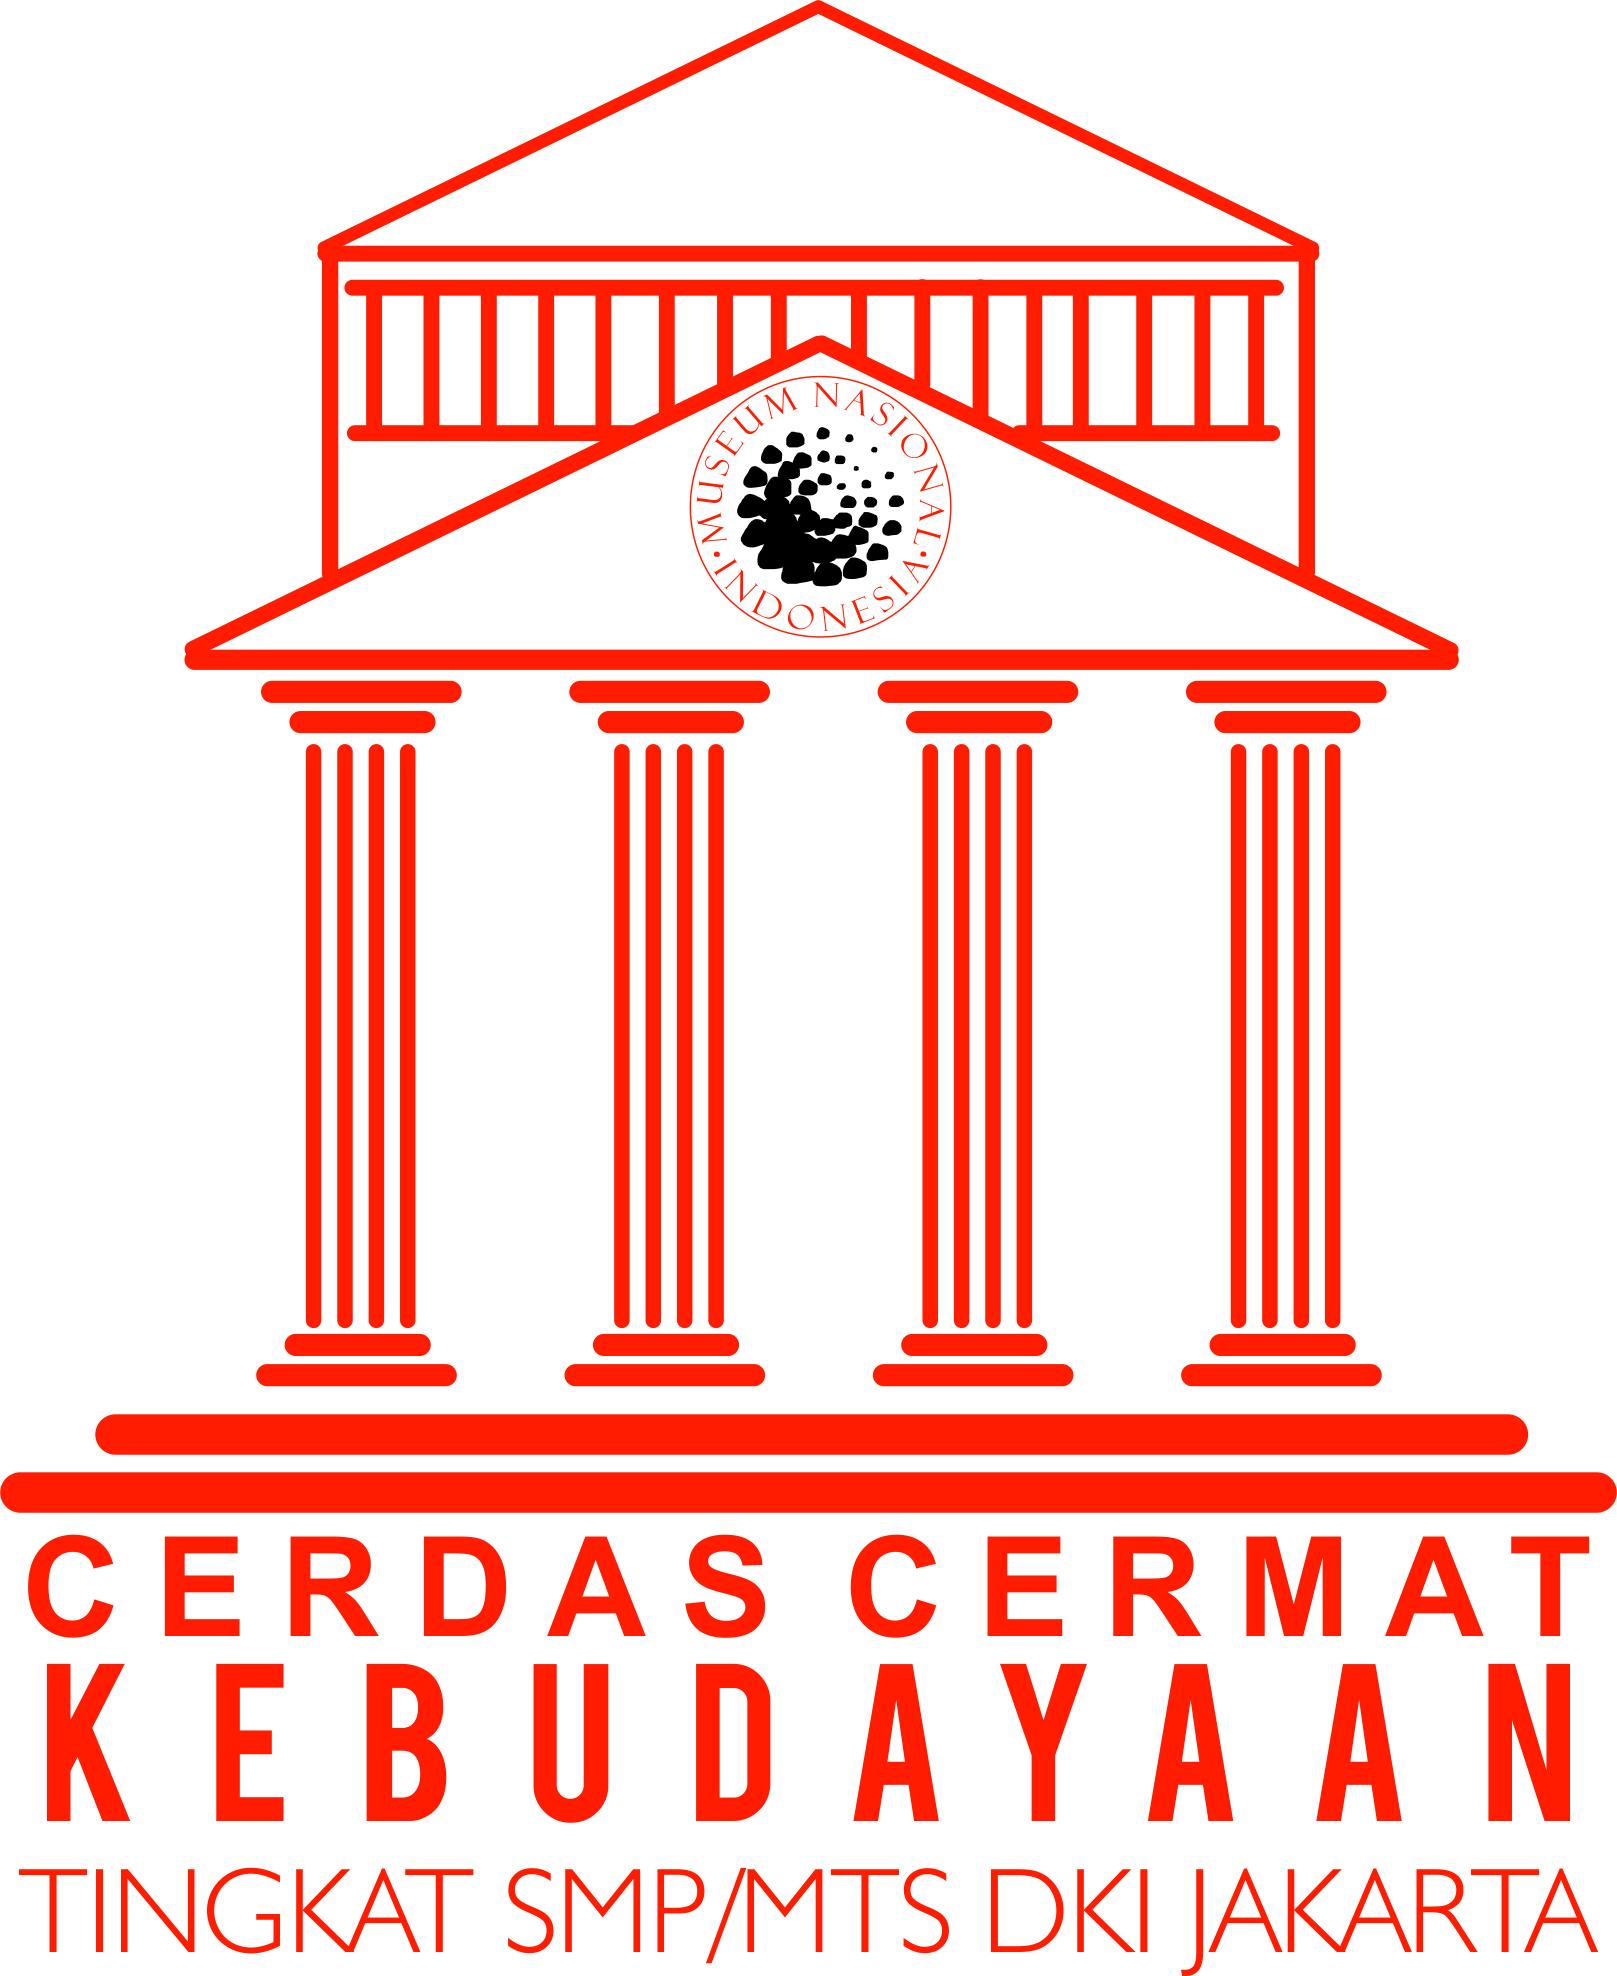 Museum Nasional Gelar Lomba Cerdas Cermat Kebudayaan 2016 Dki Wilayah